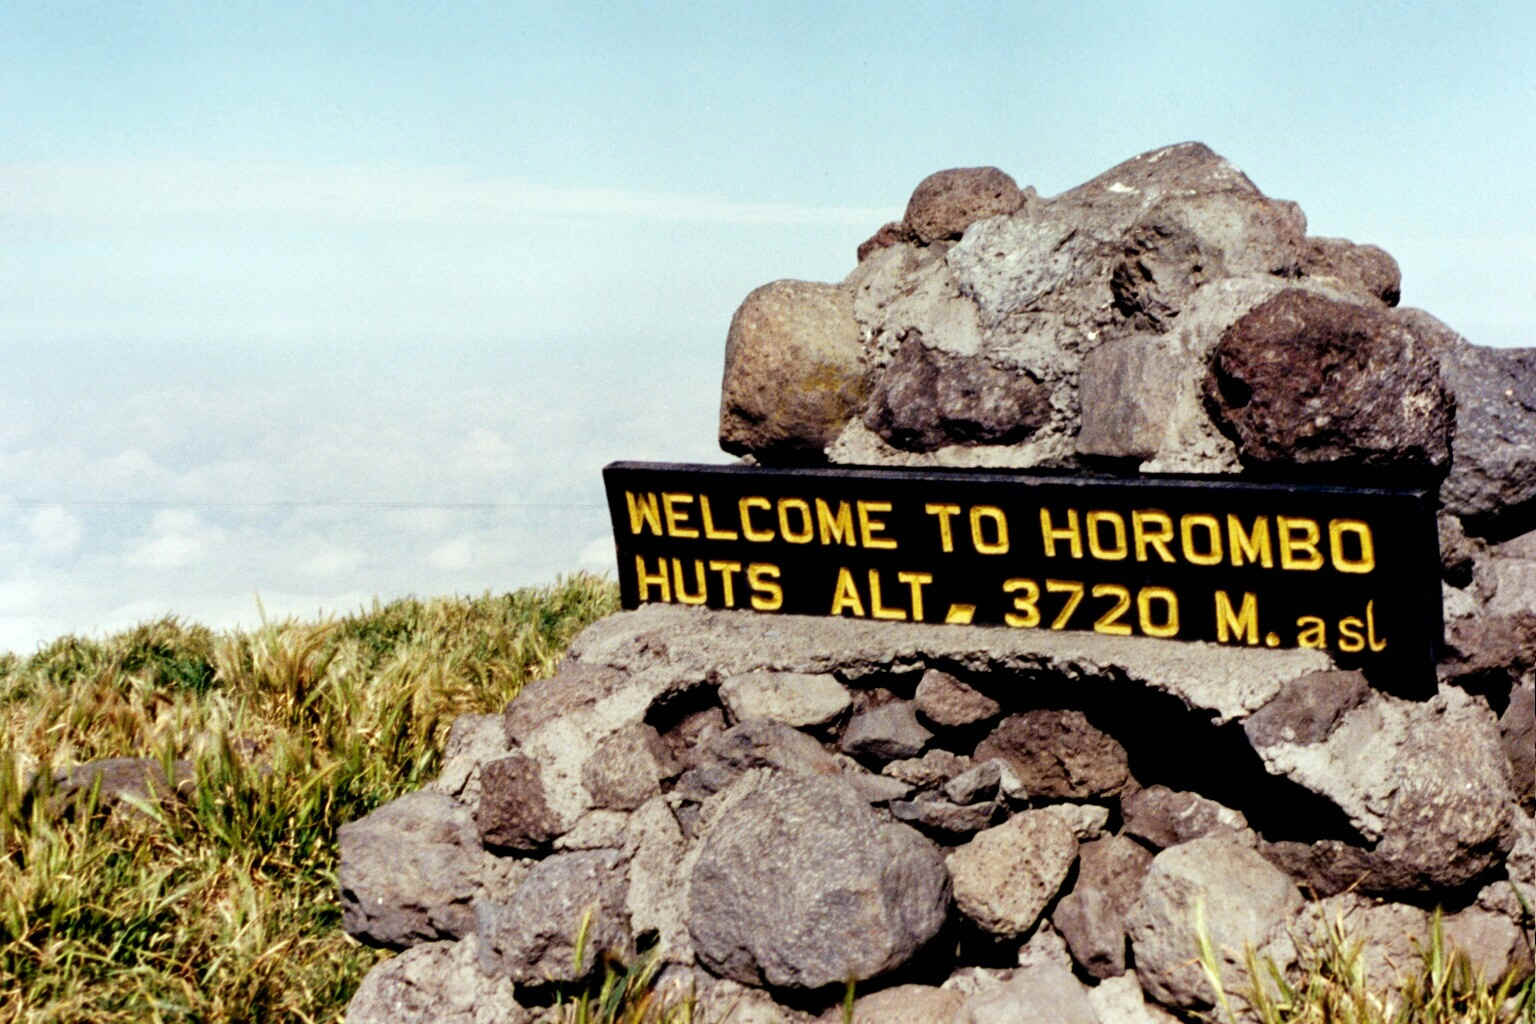 wp-content/uploads/itineraries/Kilimanjaro/kili-marangu-horombo-hut.jpg